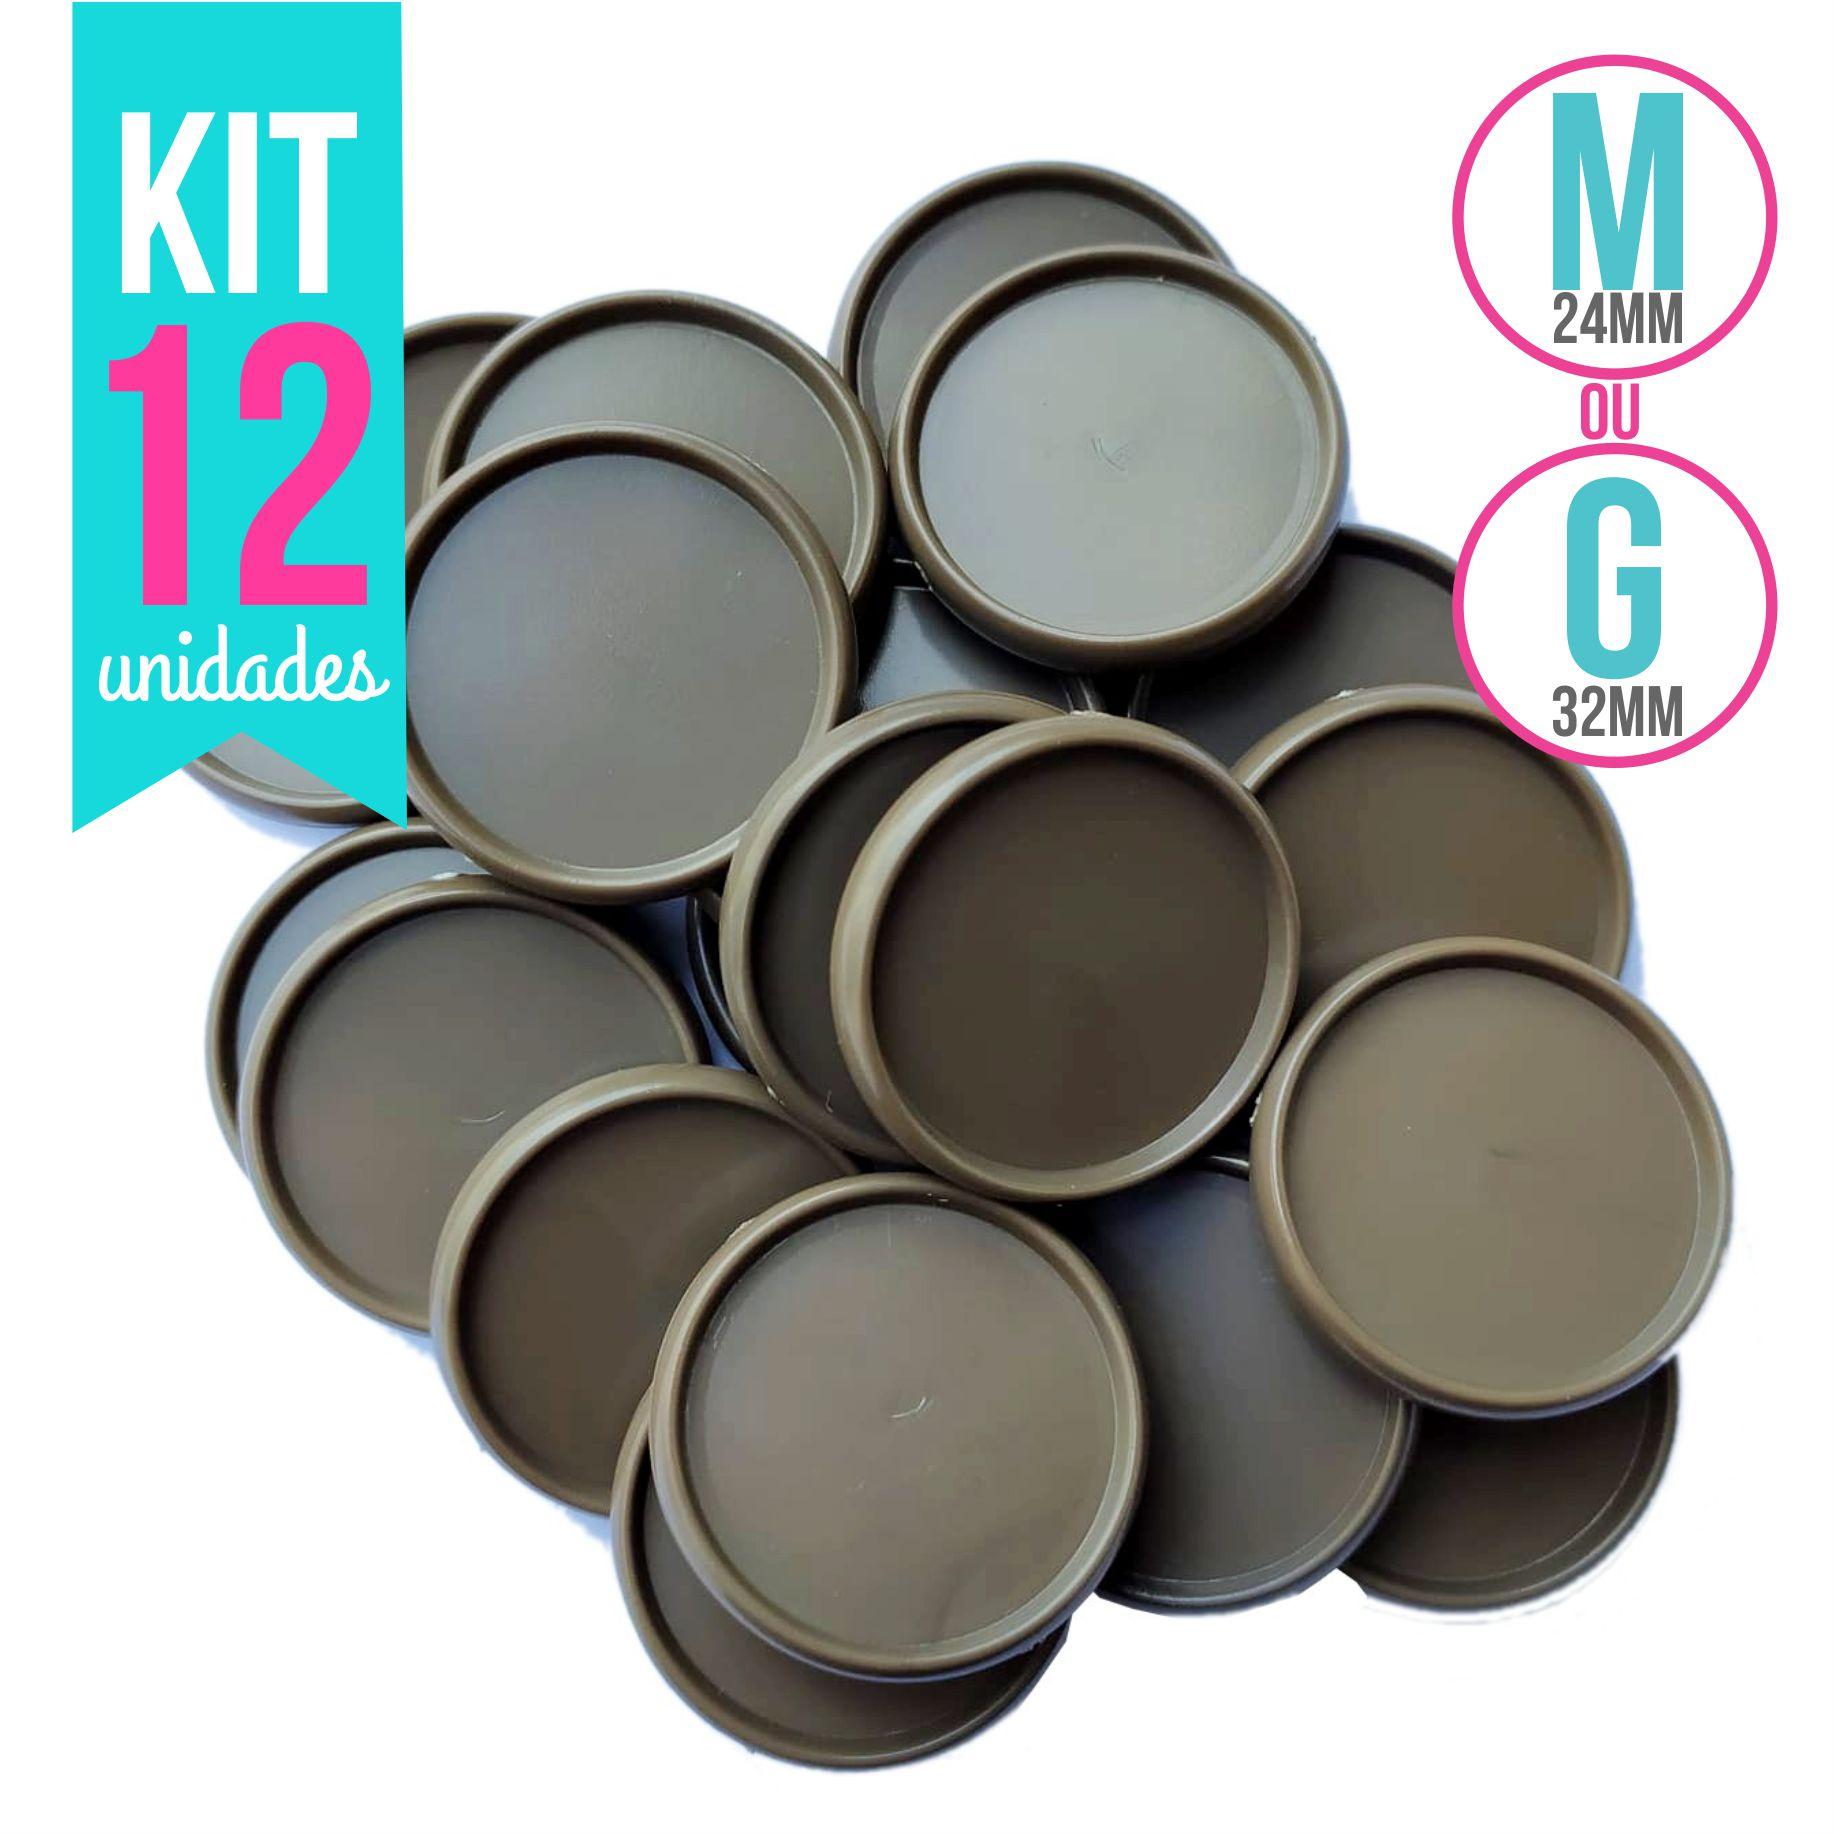 Kit 12 Discos G 32mm ou M 24mm de Caderno Infinito Sistema Inteligente Capuccino Liso Amor Infinito -  Marrom